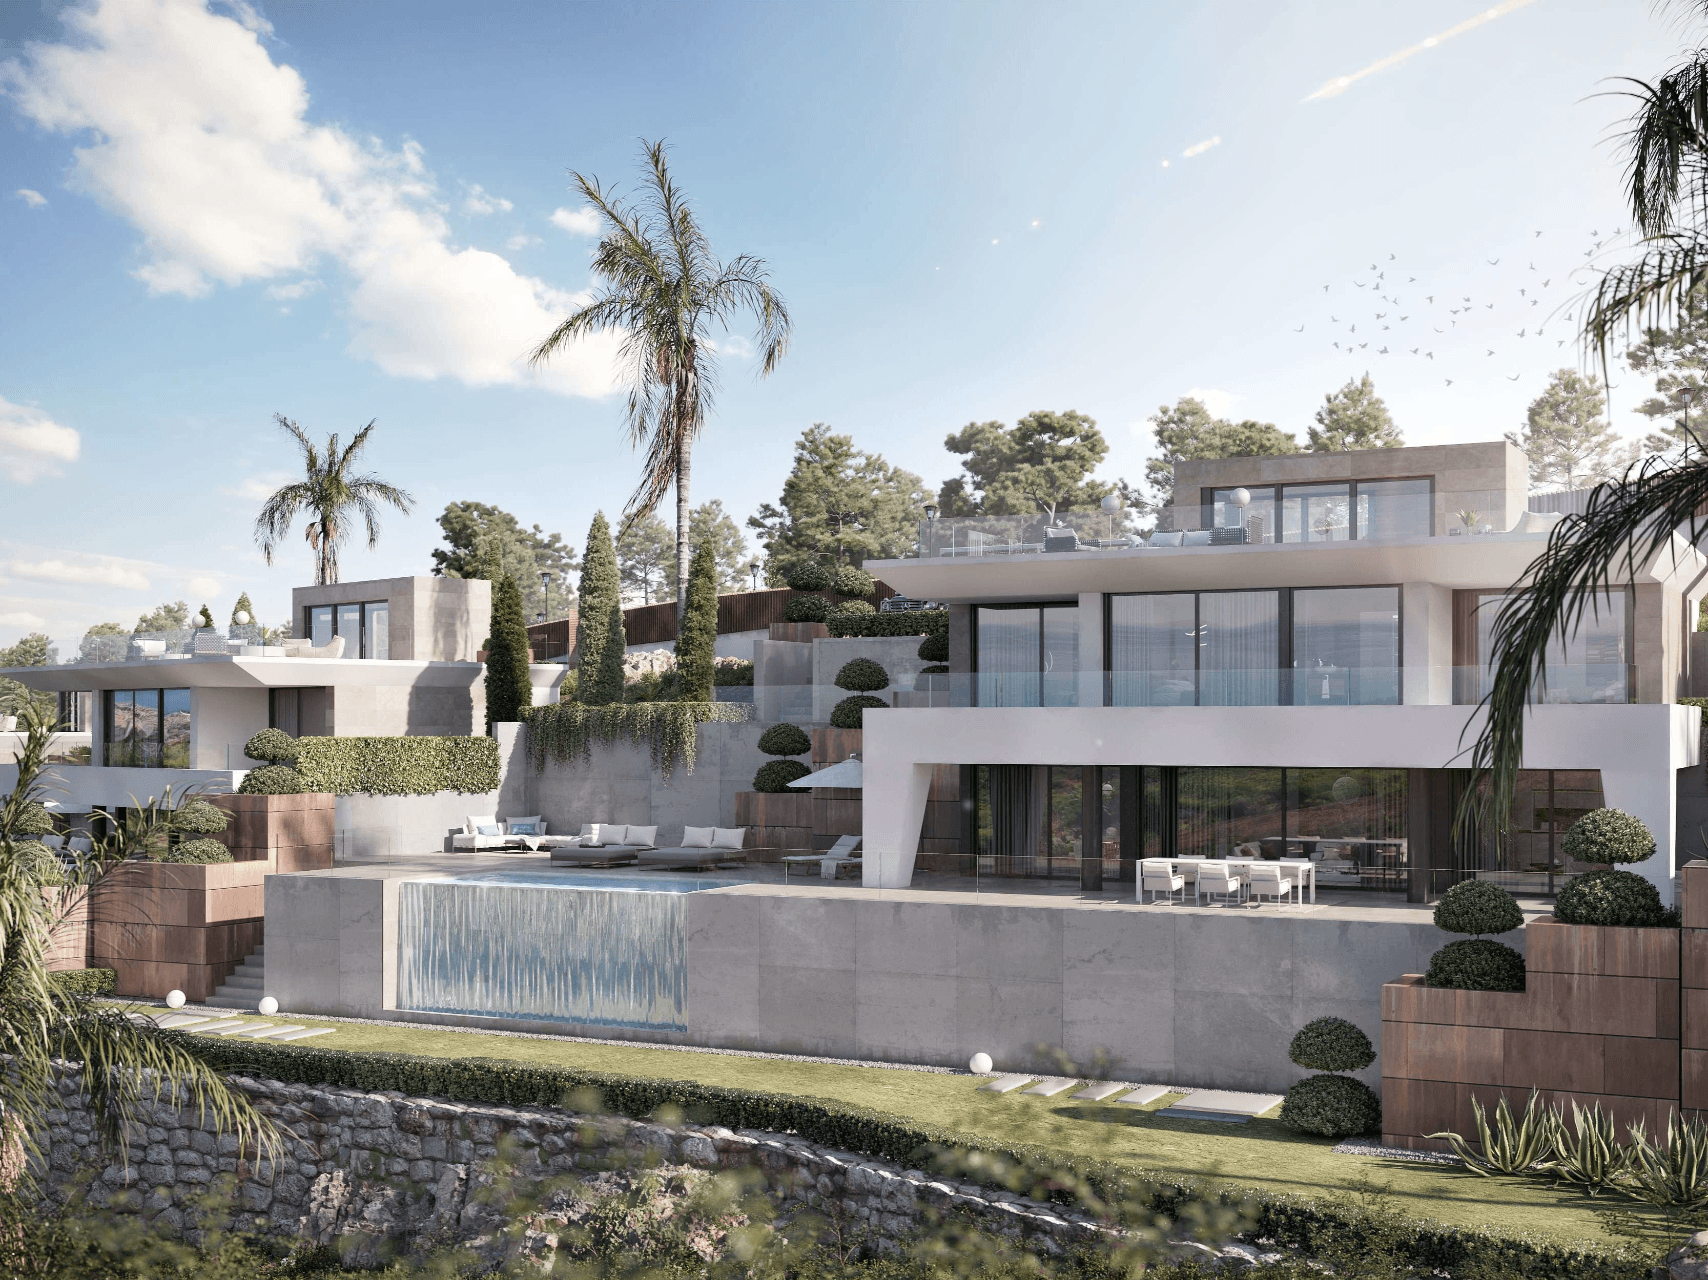 Nieuwbouw in La Duquesa (Spanje, Costa del Sol)